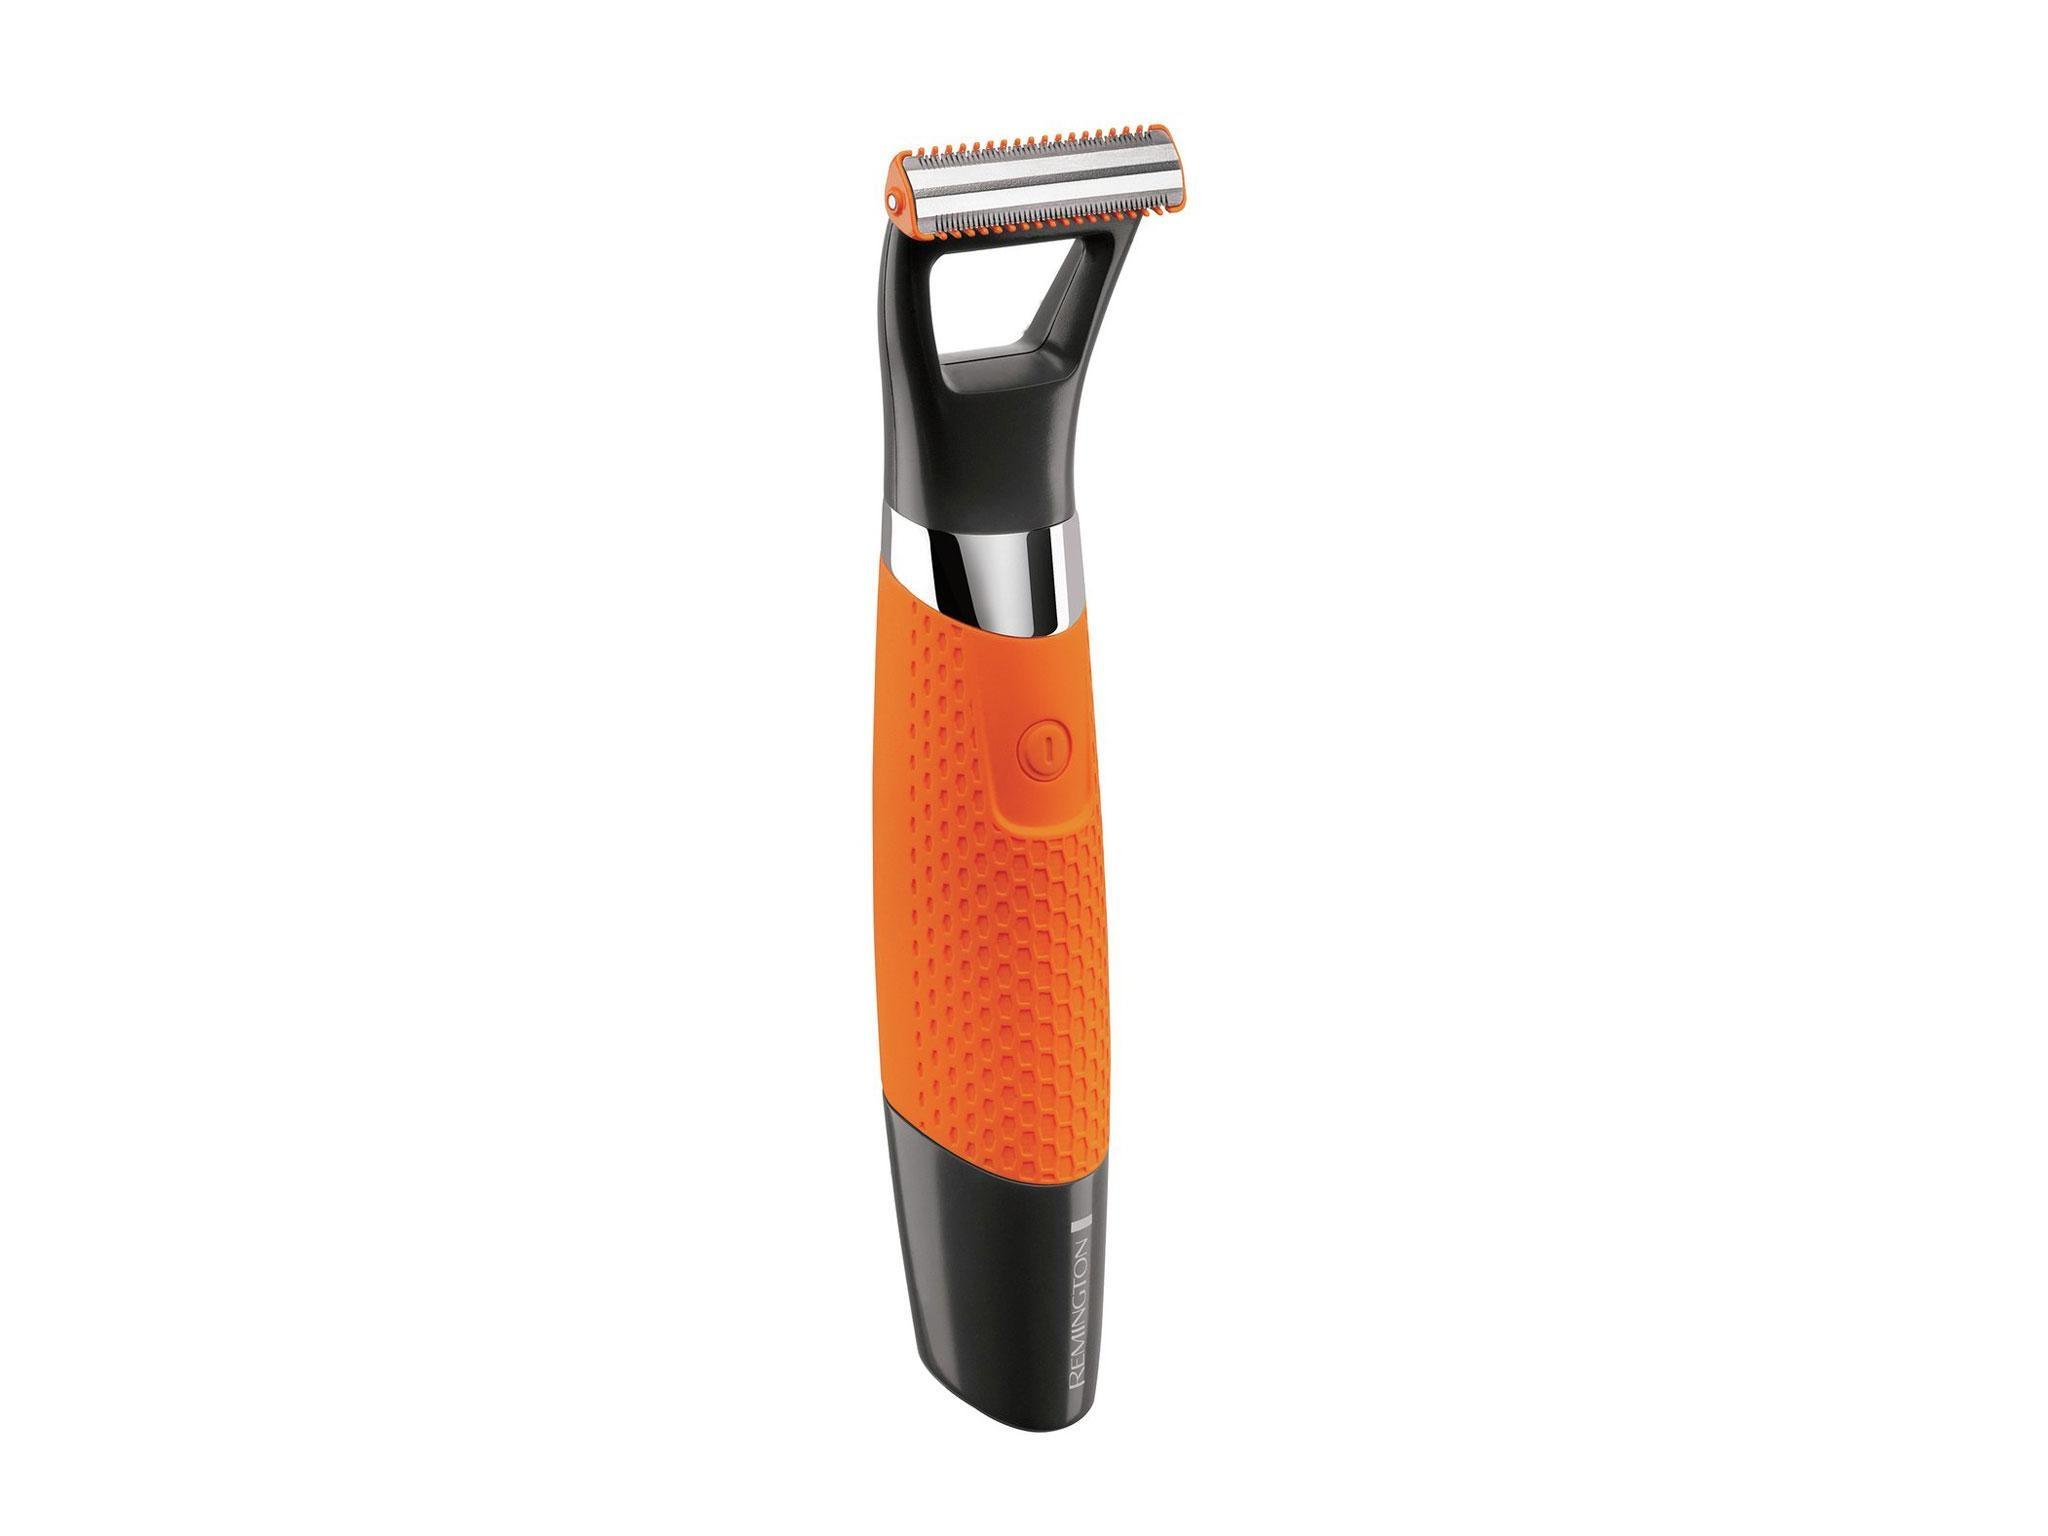 Philips Norelco Beard Head Trimmer 5100